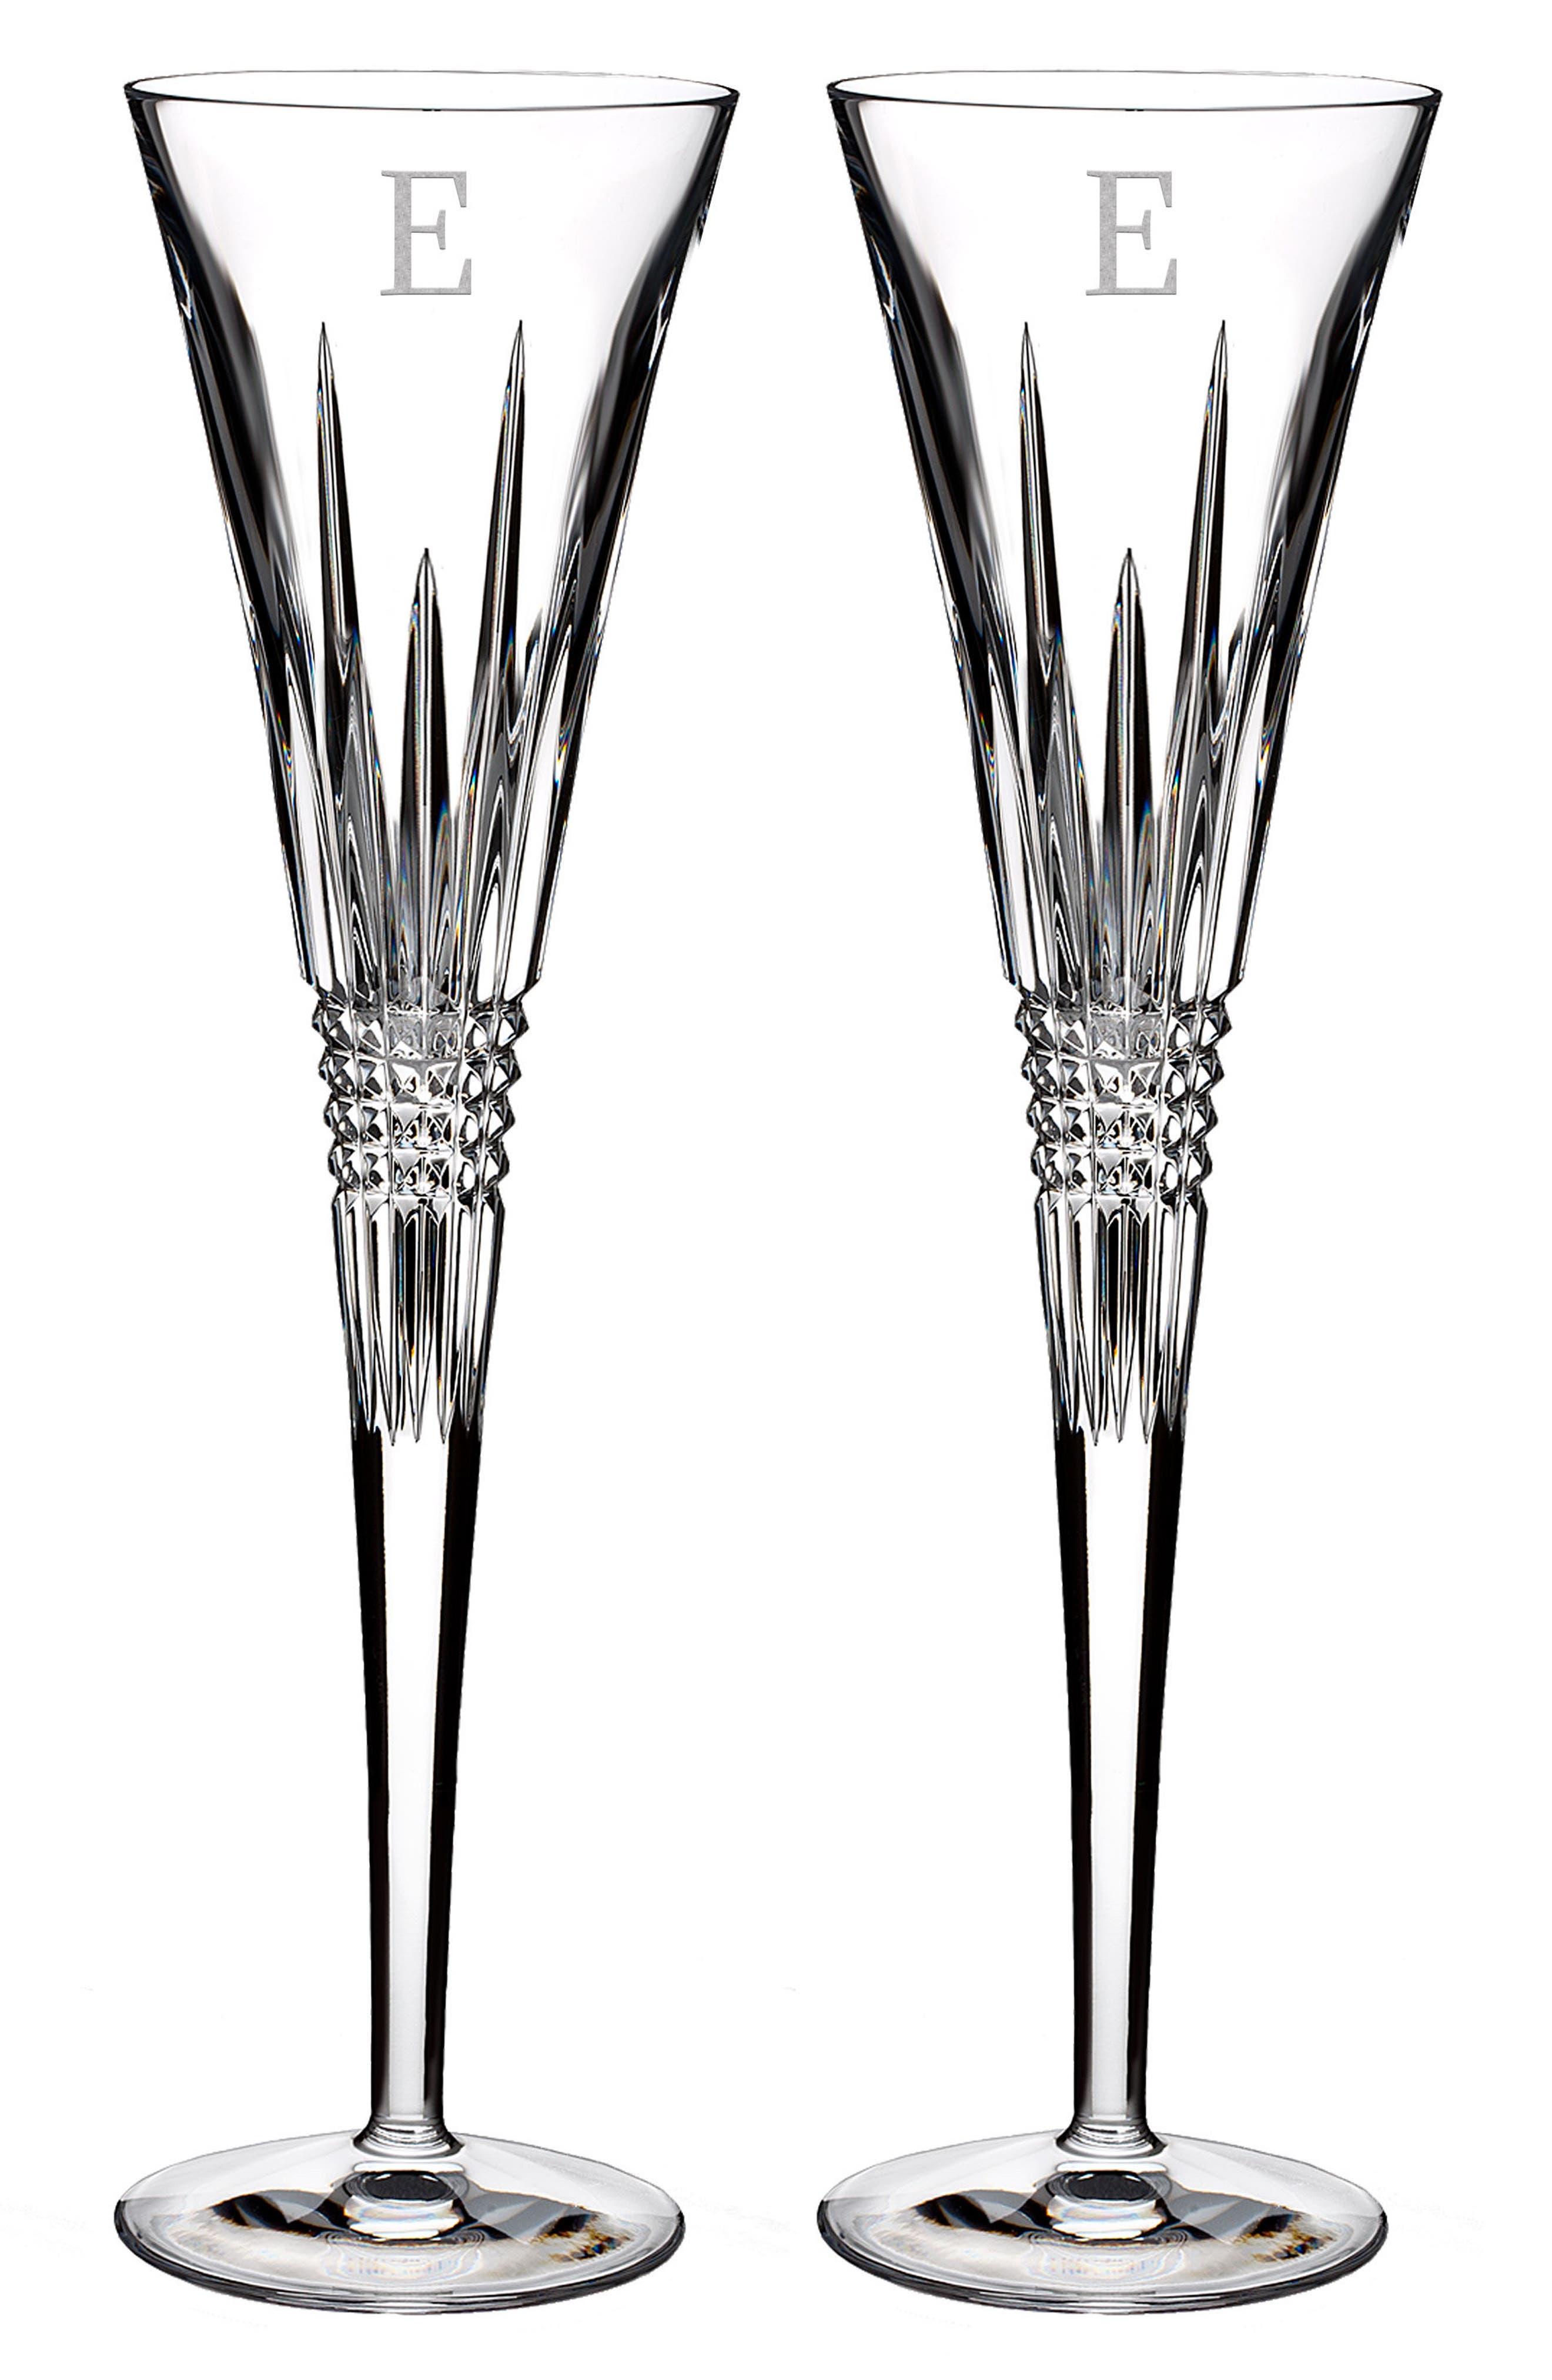 waterford lismore diamond set of 2 monogram lead crystal champagne flutes - Waterford Champagne Flutes